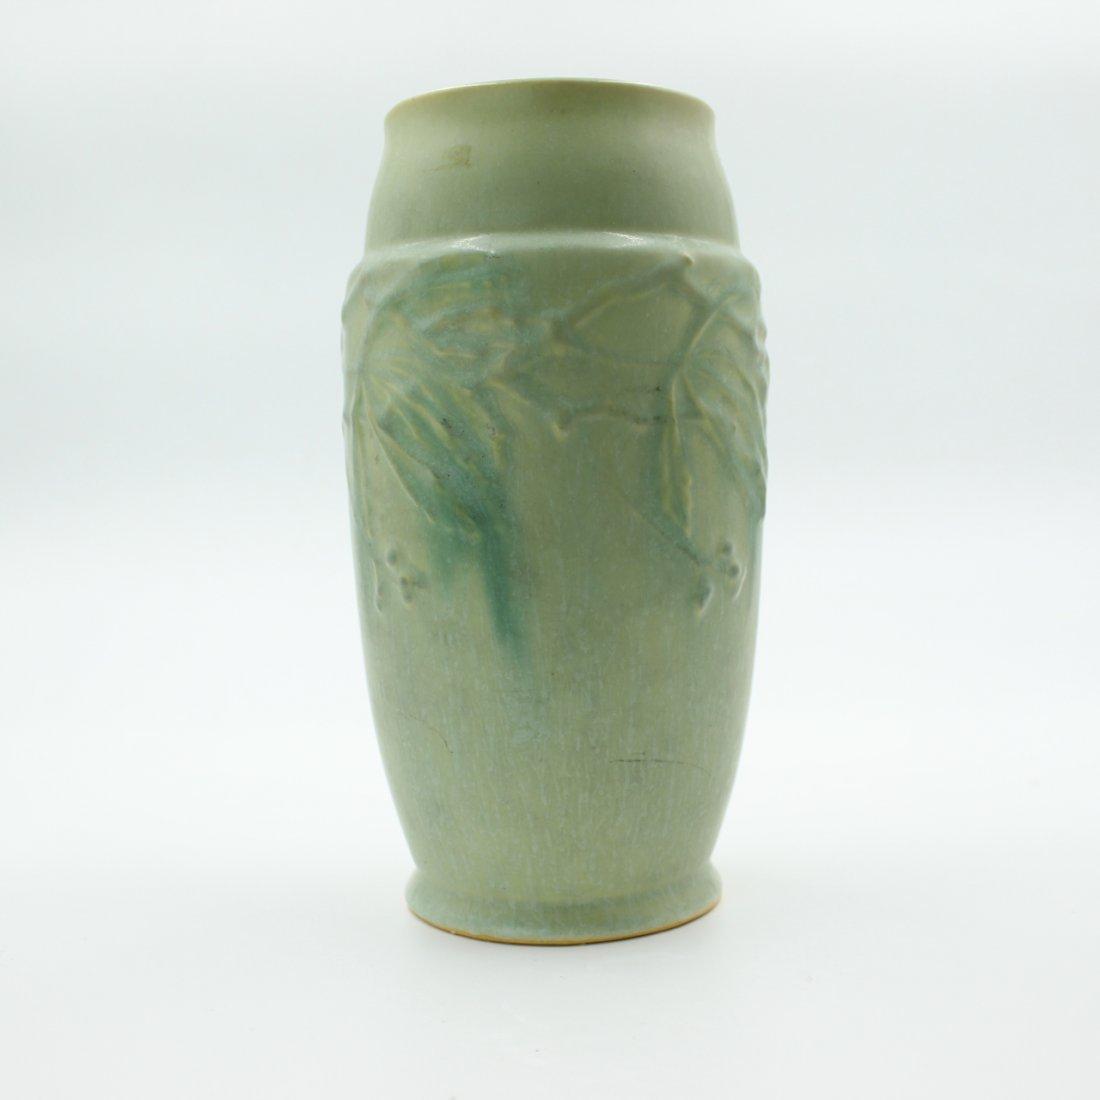 C. 1927 Roseville Cremona Vase #355-8